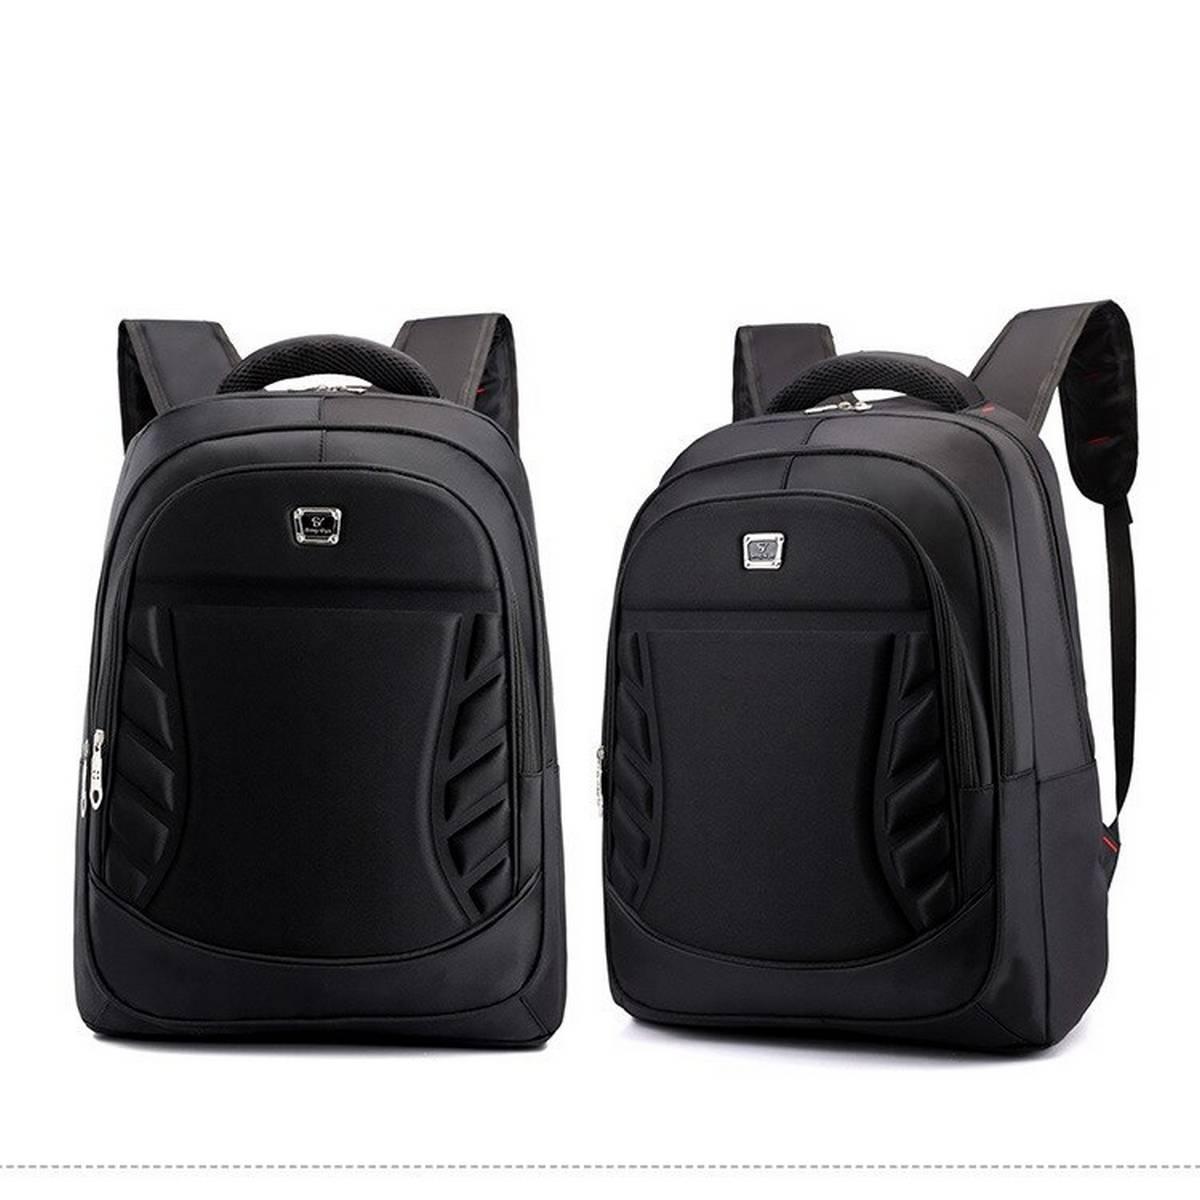 Hard Shell Pattern bag - School college laptop university bagpack For boys / girls Backpack